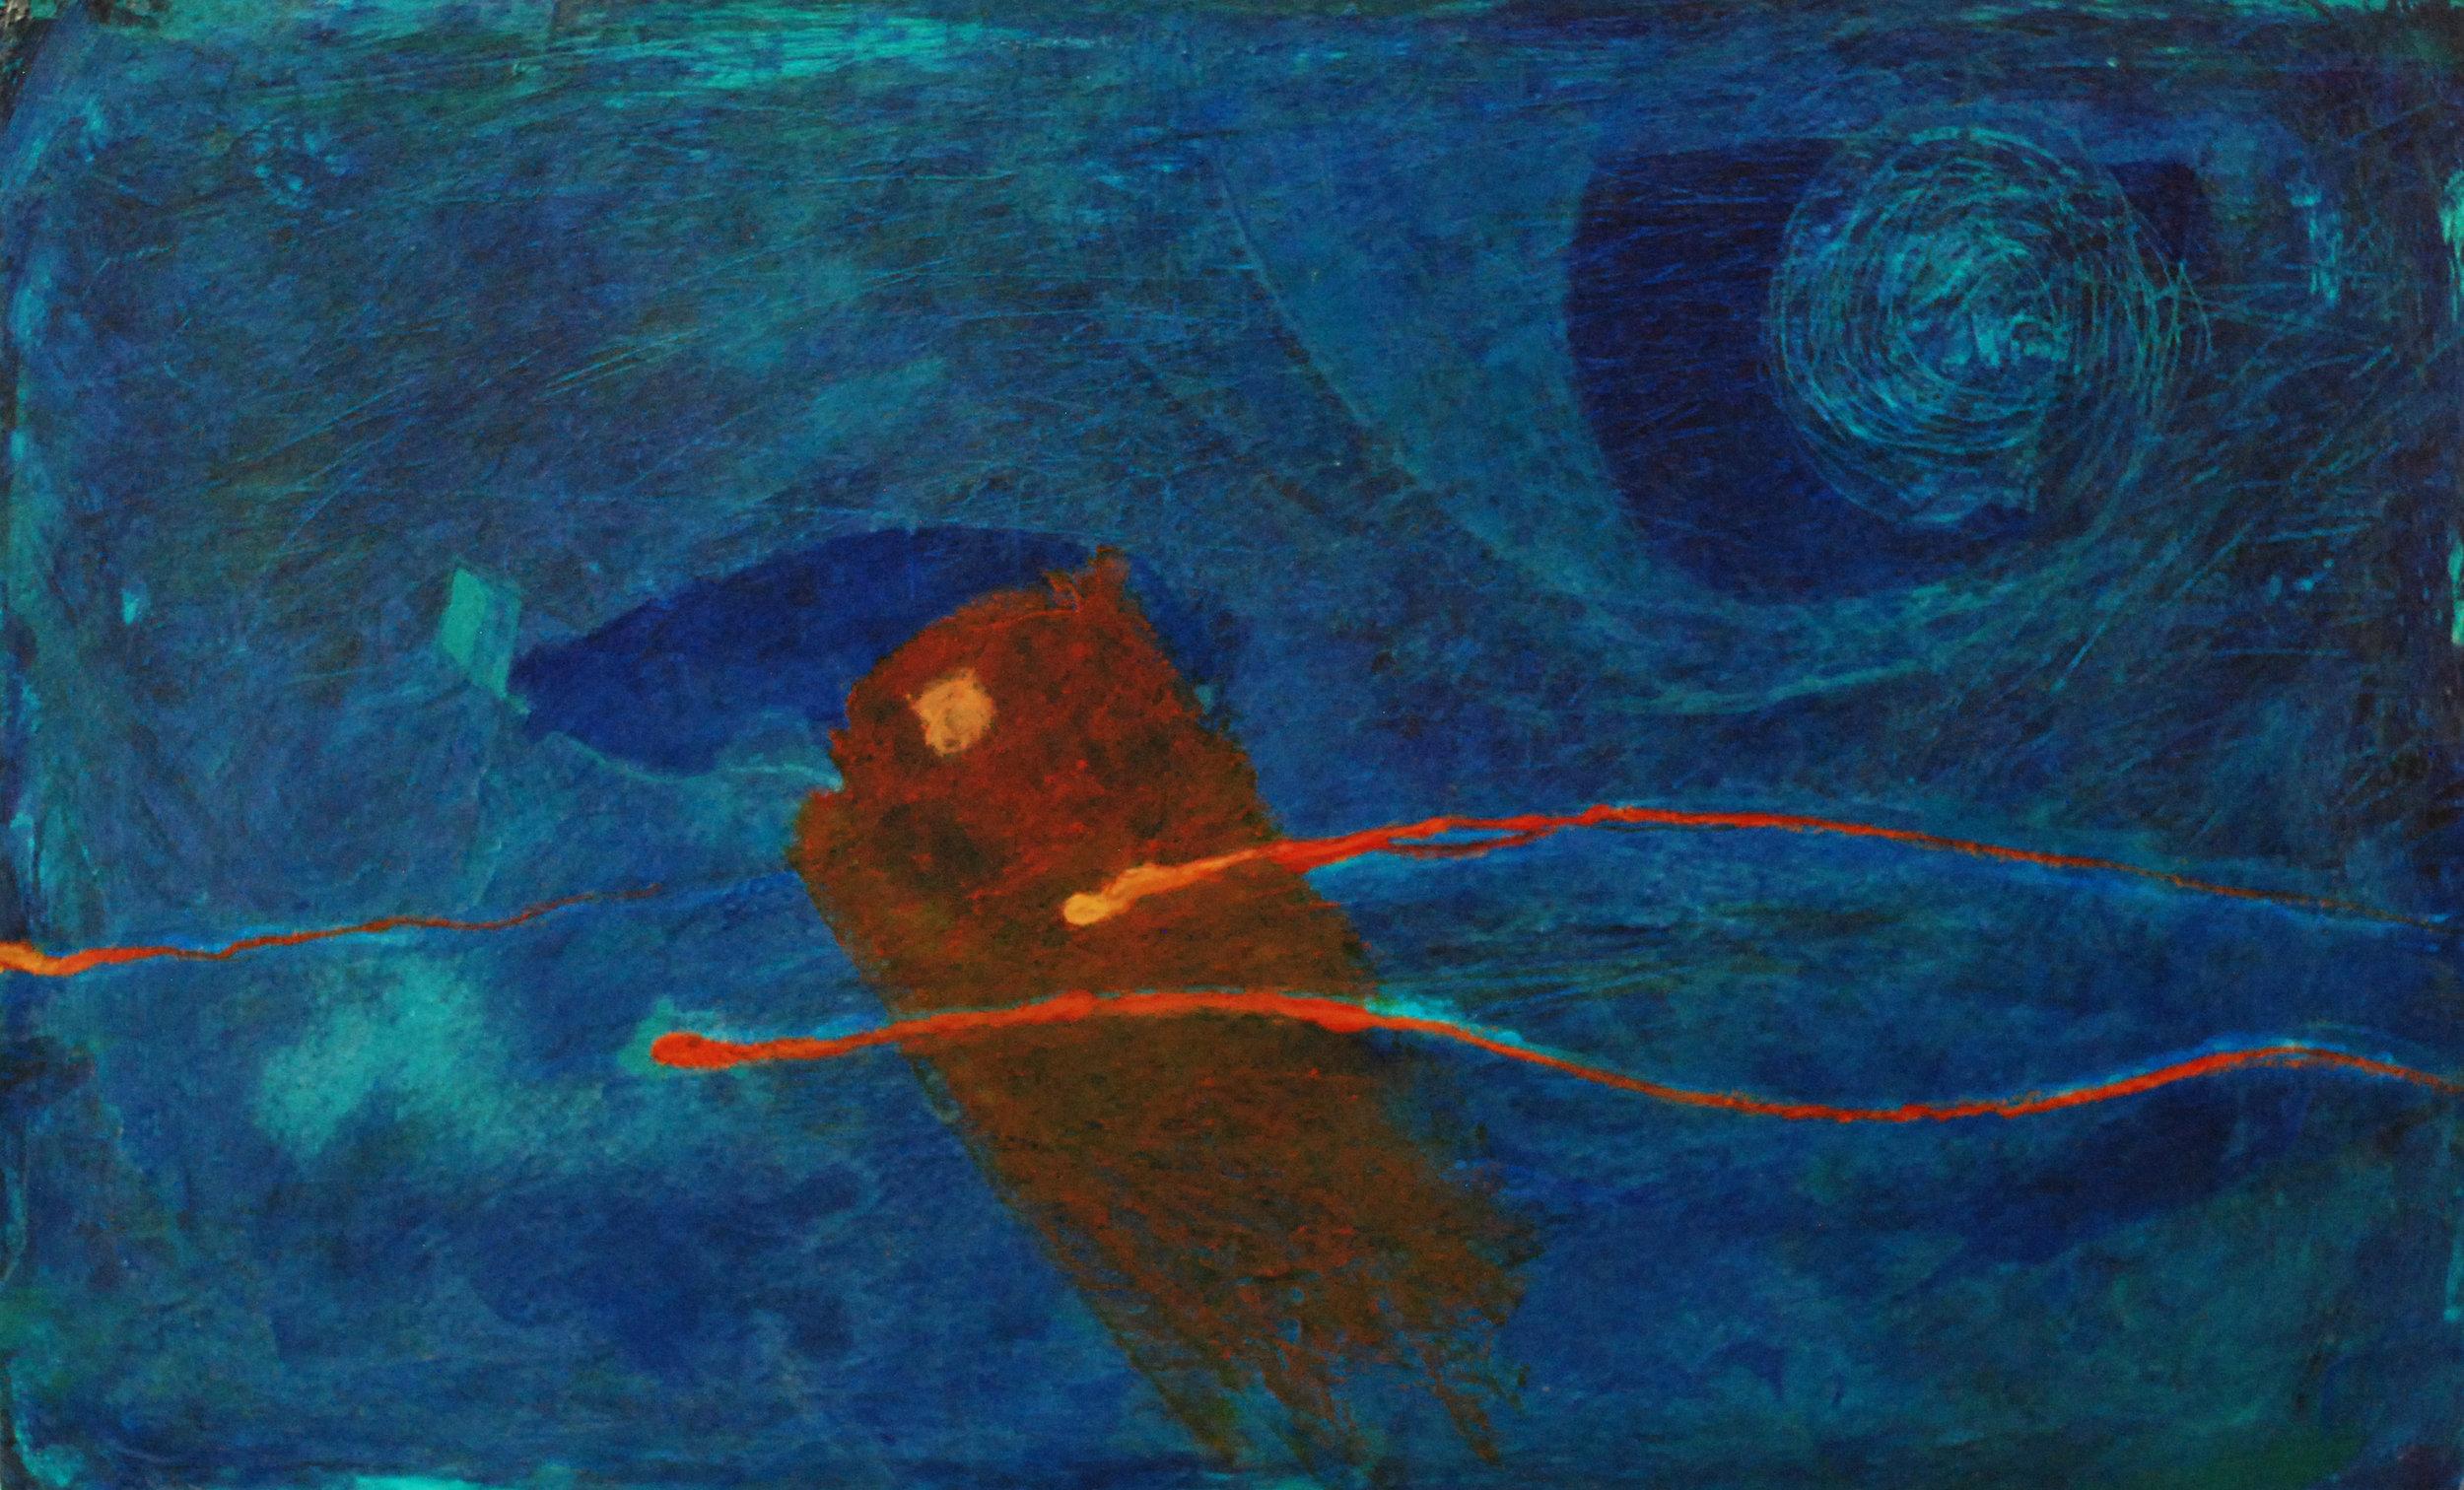 "'Sea Creature & The Kite'    Acrylic & Mixed Media on Board, 12"" x 20"""